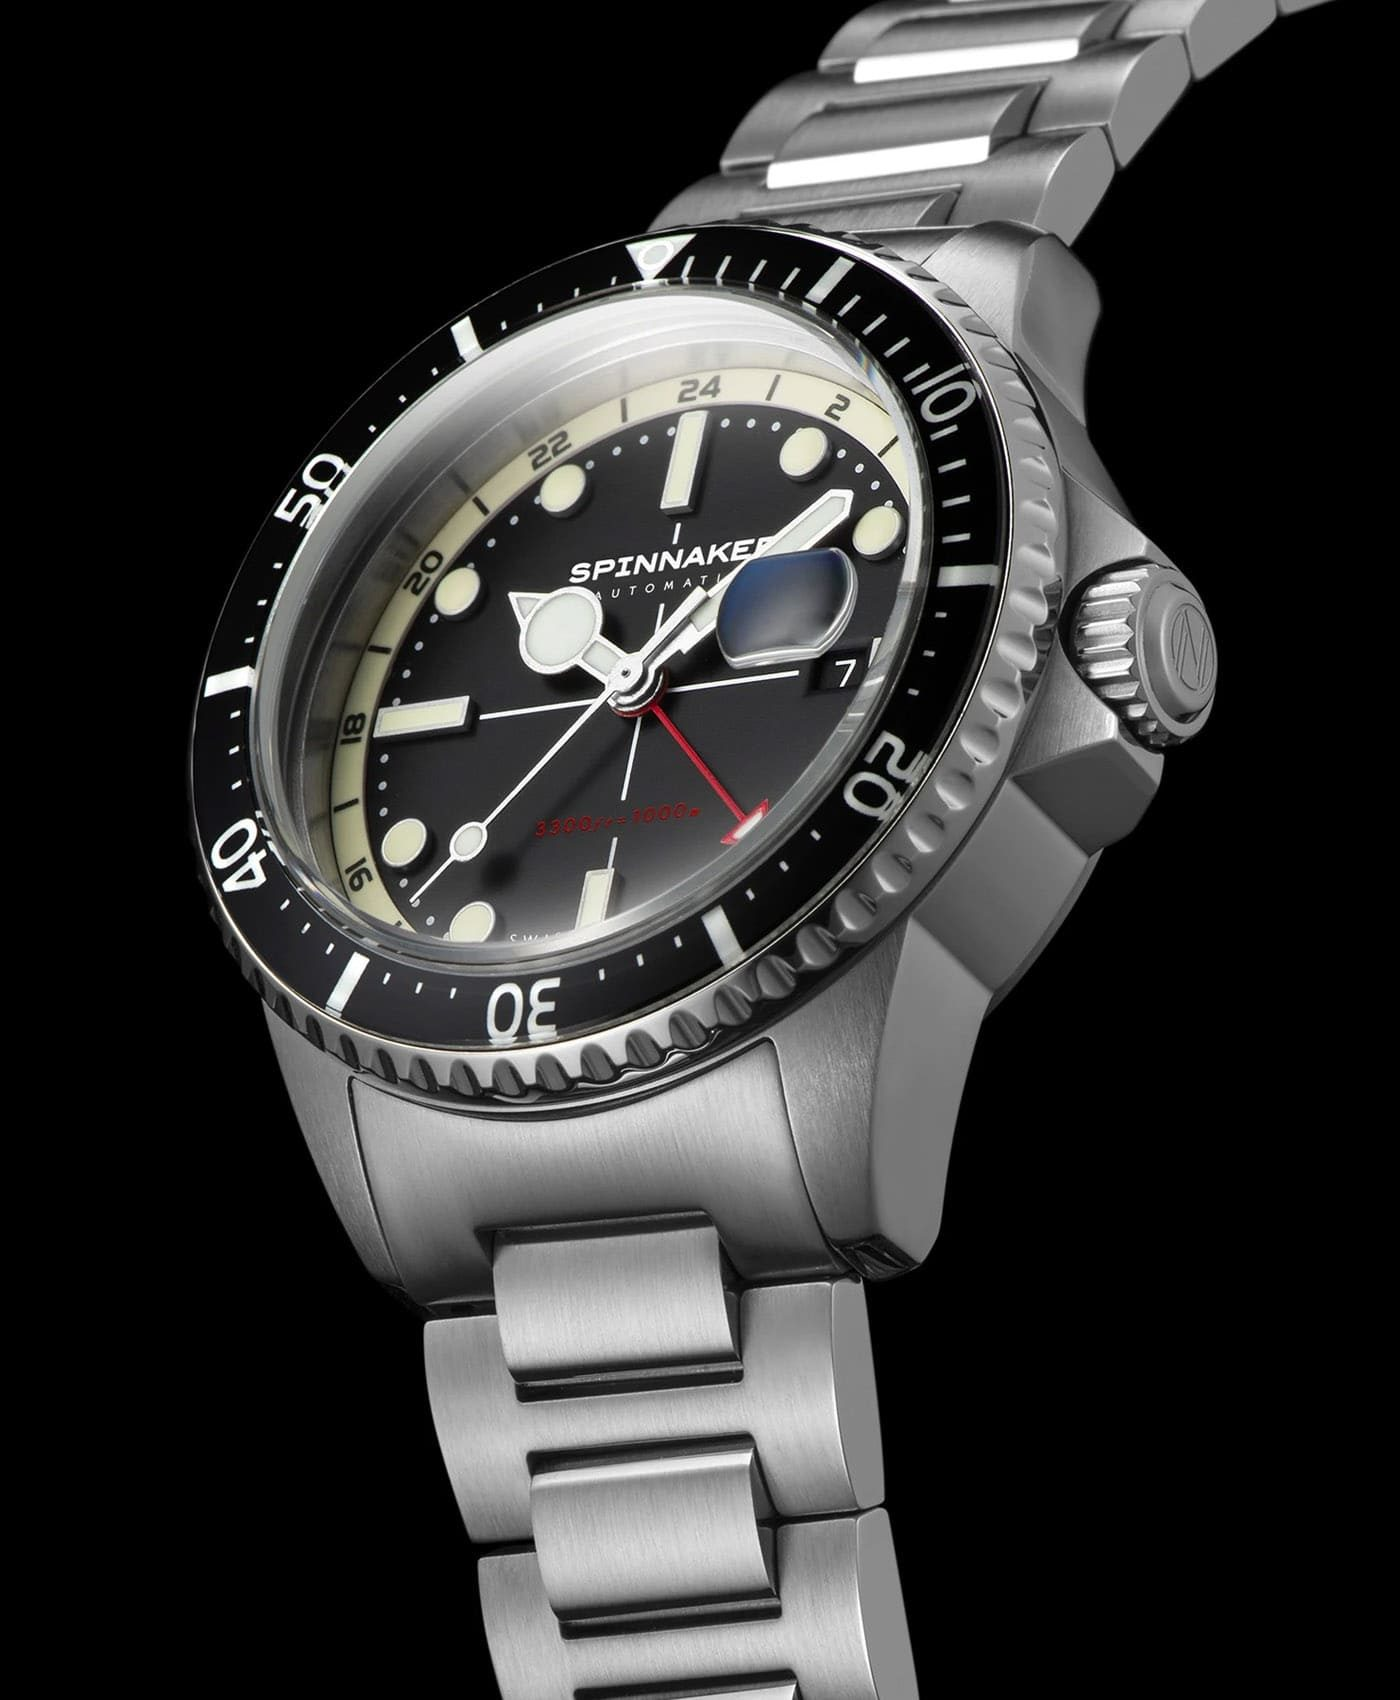 Spinnaker Tesei Mille Metri GMT - Midnight Black SP-5091-11 Side